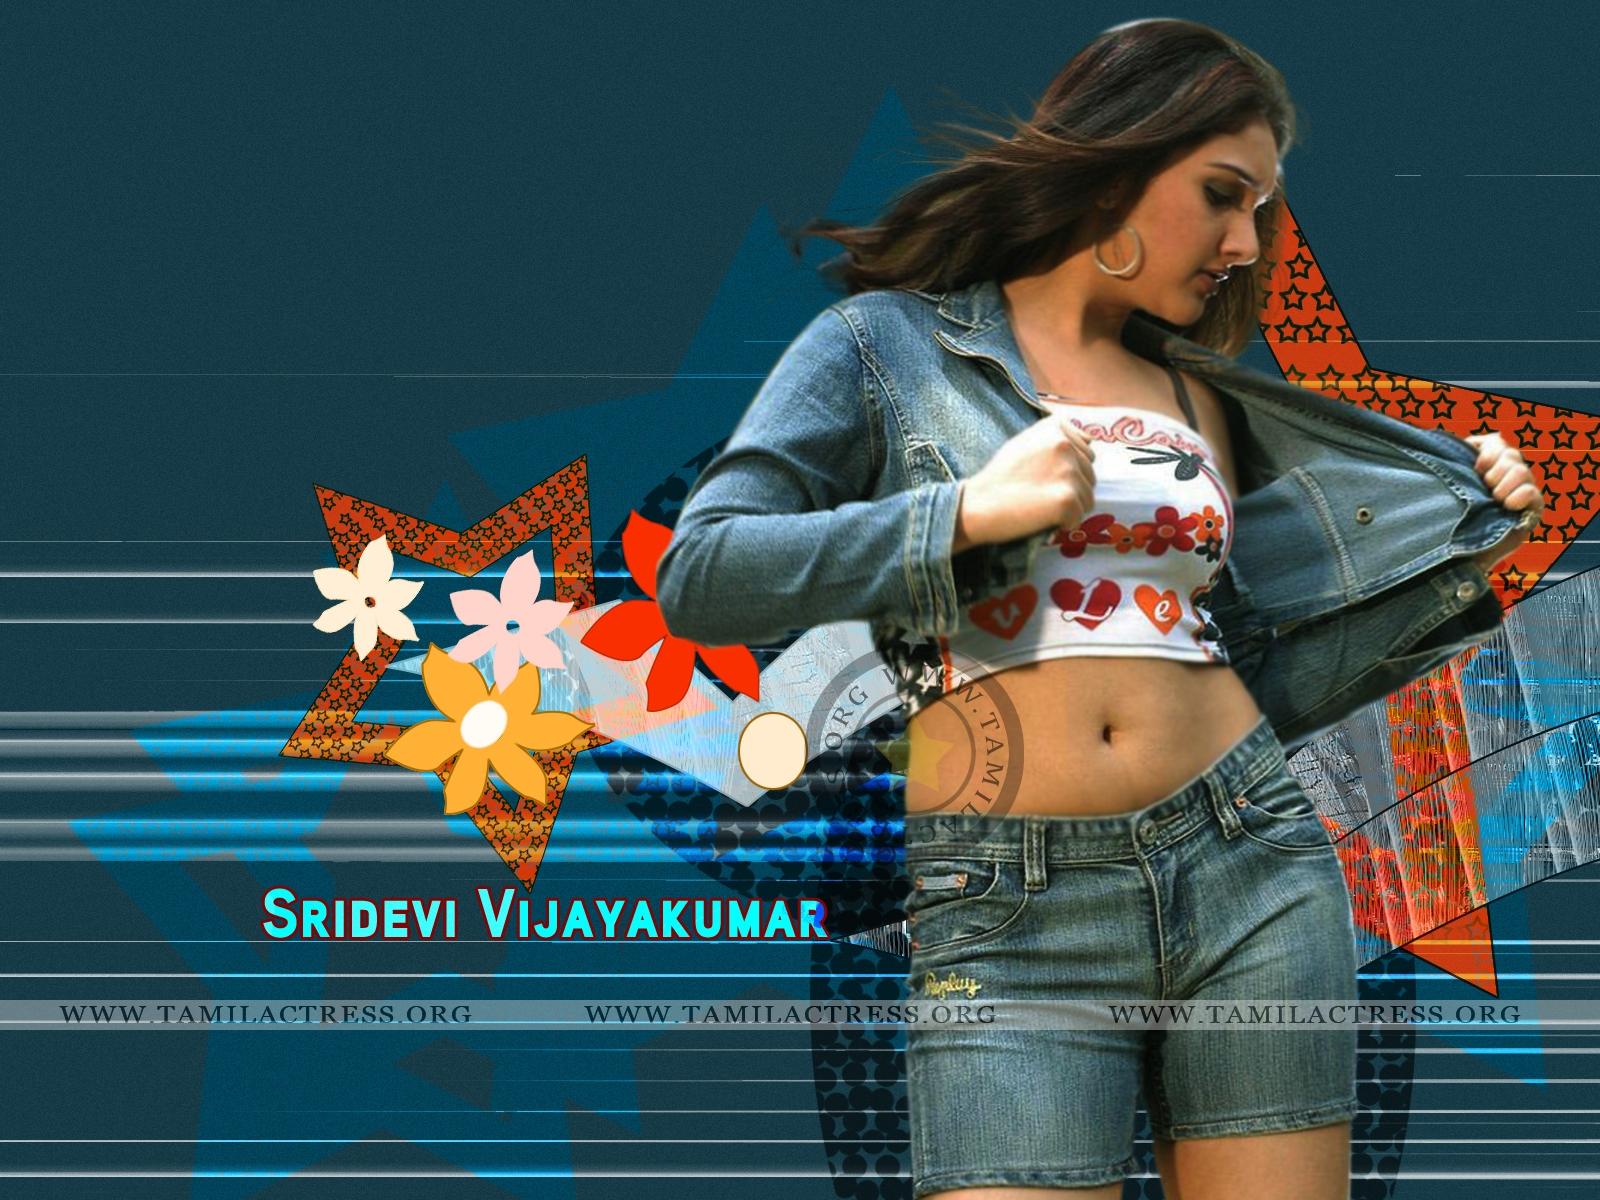 http://3.bp.blogspot.com/-wjjd4ju4R1E/Td_Y2lOicwI/AAAAAAAAAGg/vs5bAzr60dY/s1600/Sridevi-Vijayakumar-Wallpaper-002.jpg